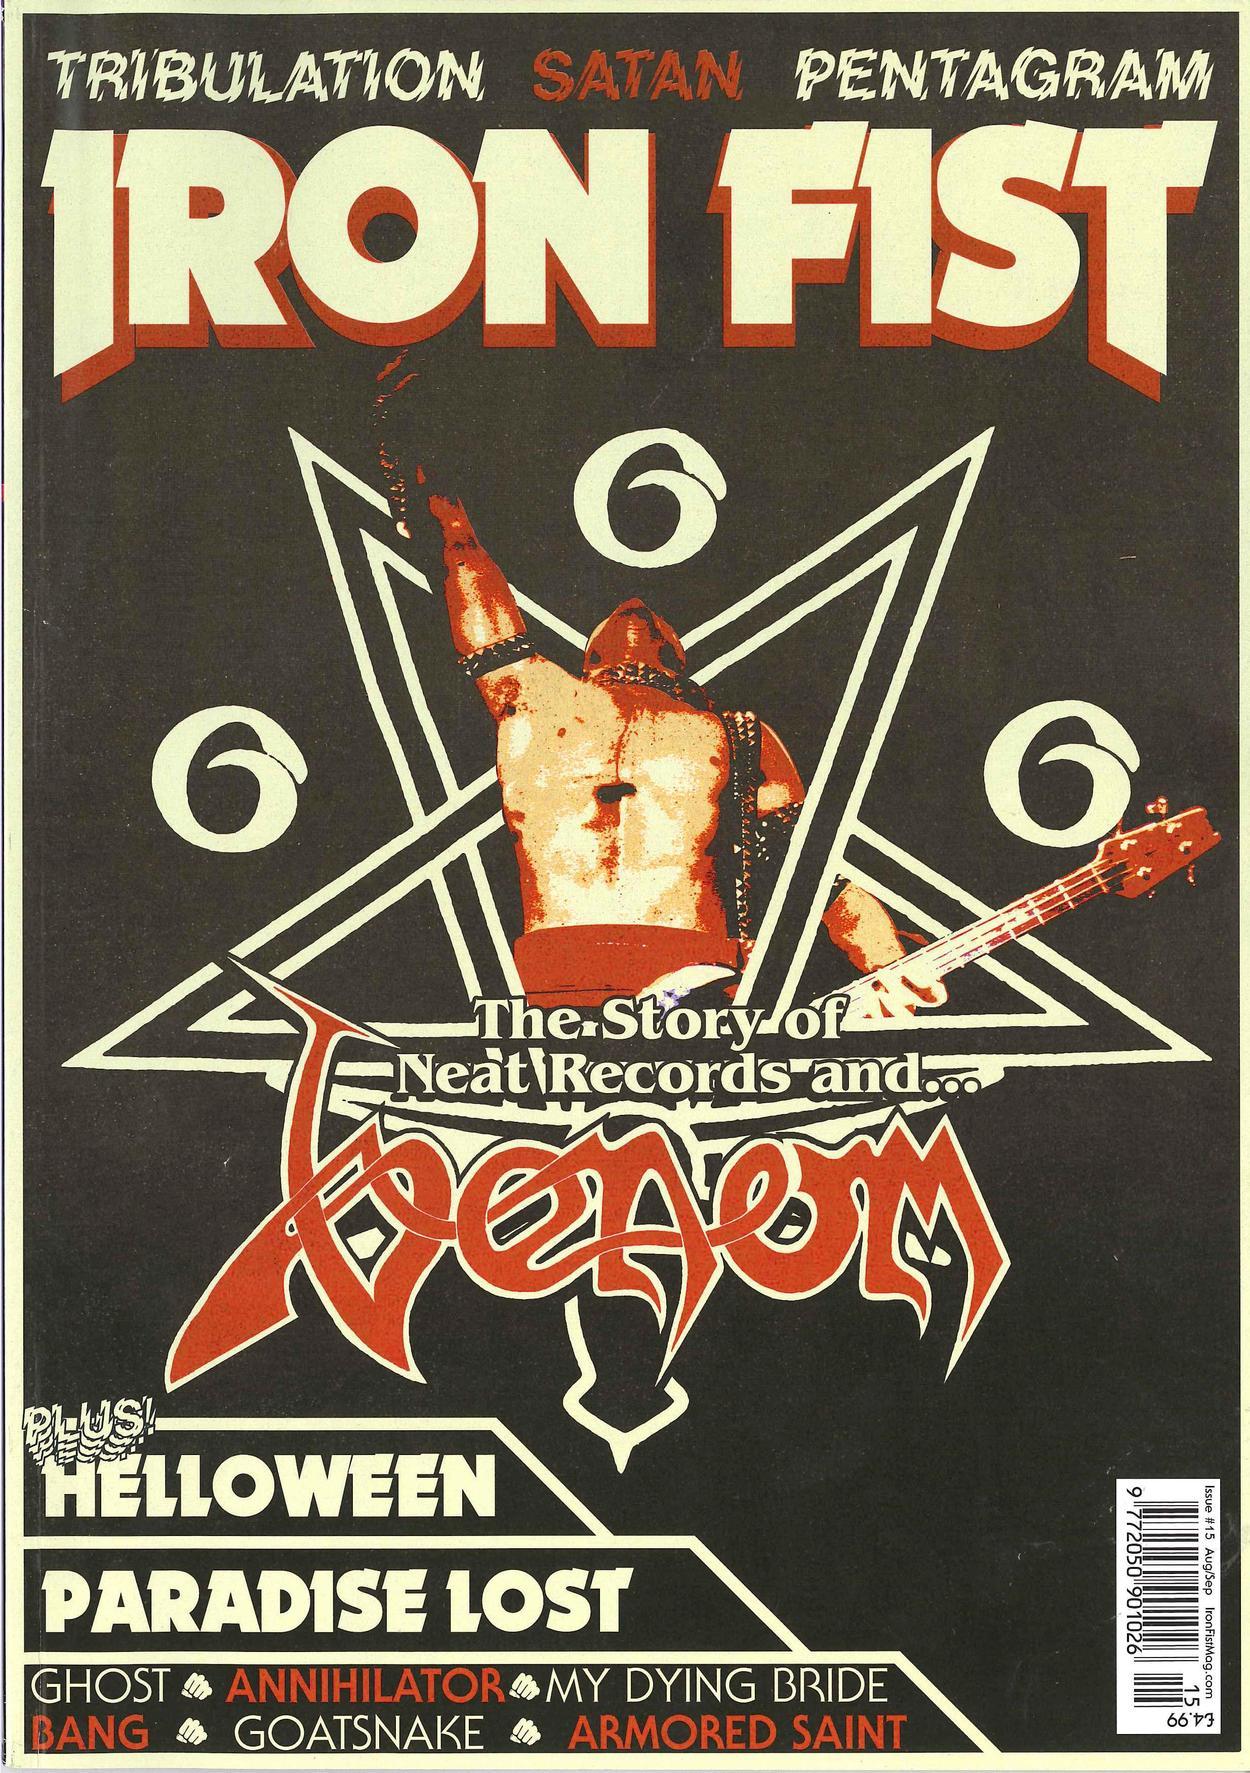 venom black metal iron fist magazine cover cronos